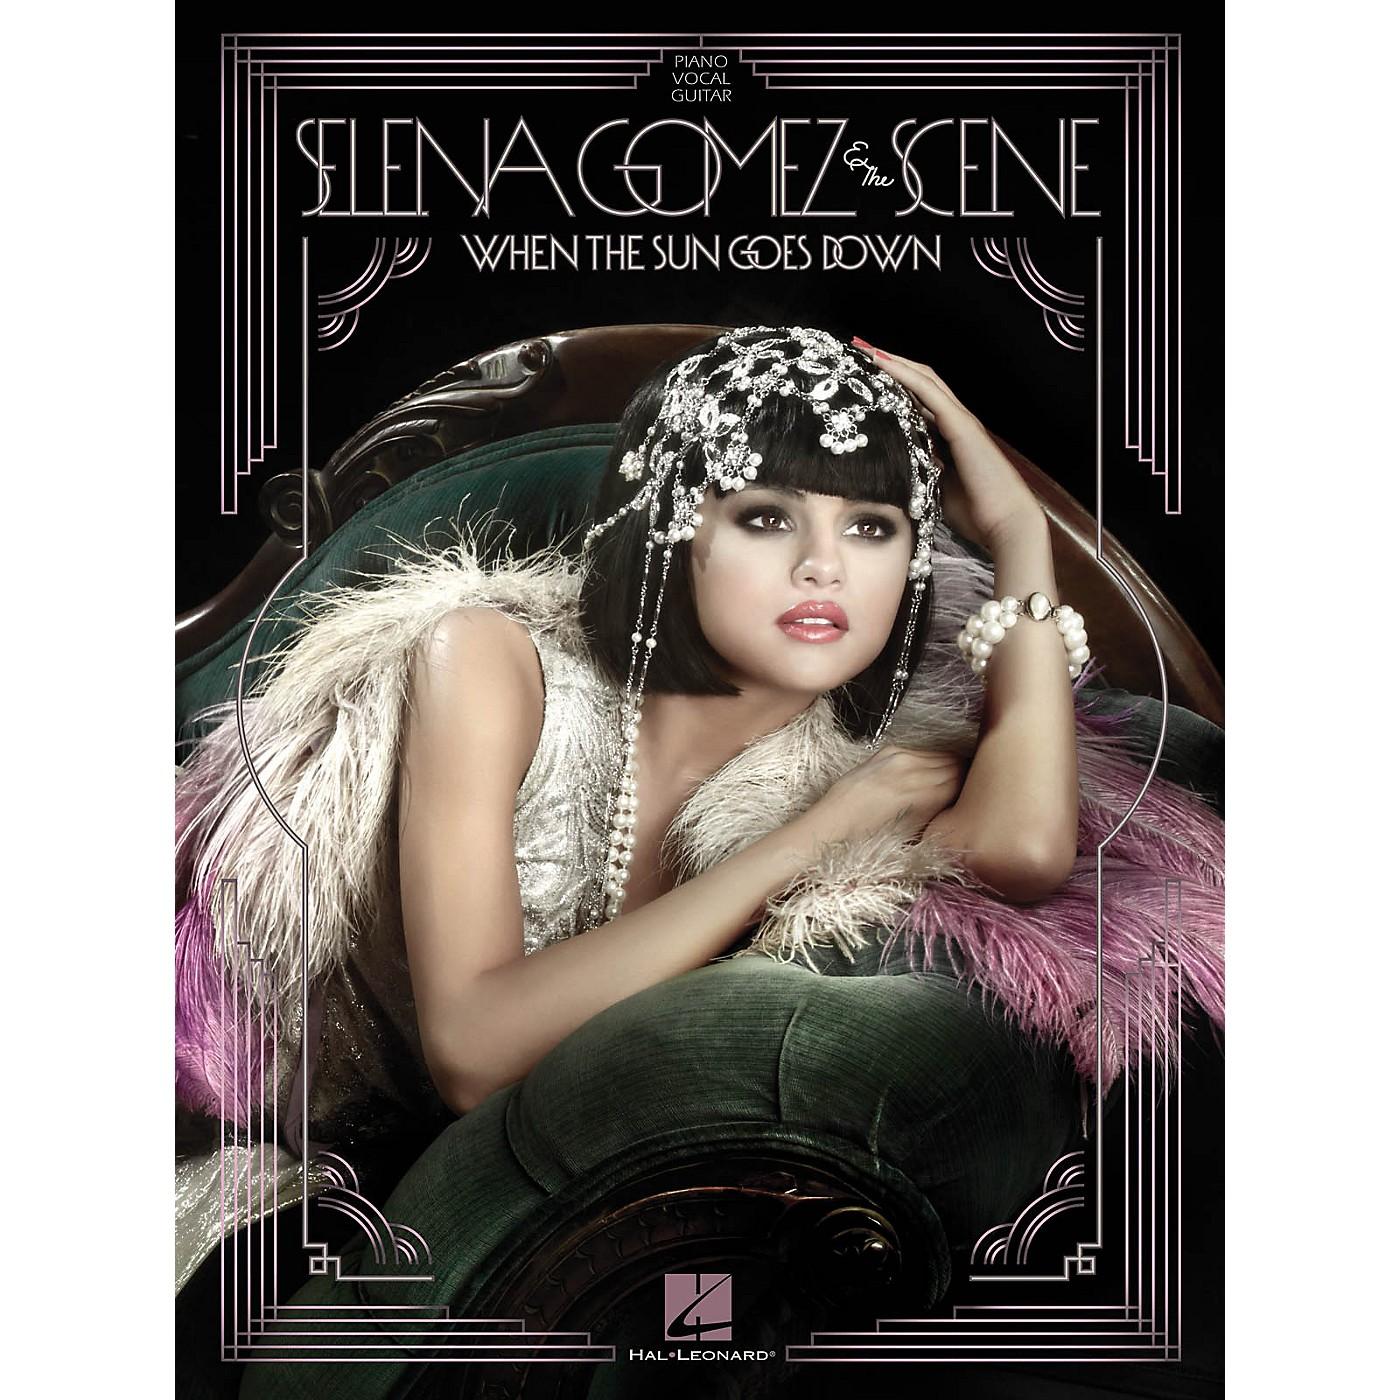 Hal Leonard Selena Gomez And The Scene - When The Sun Goes Down P/V/G Songbook thumbnail